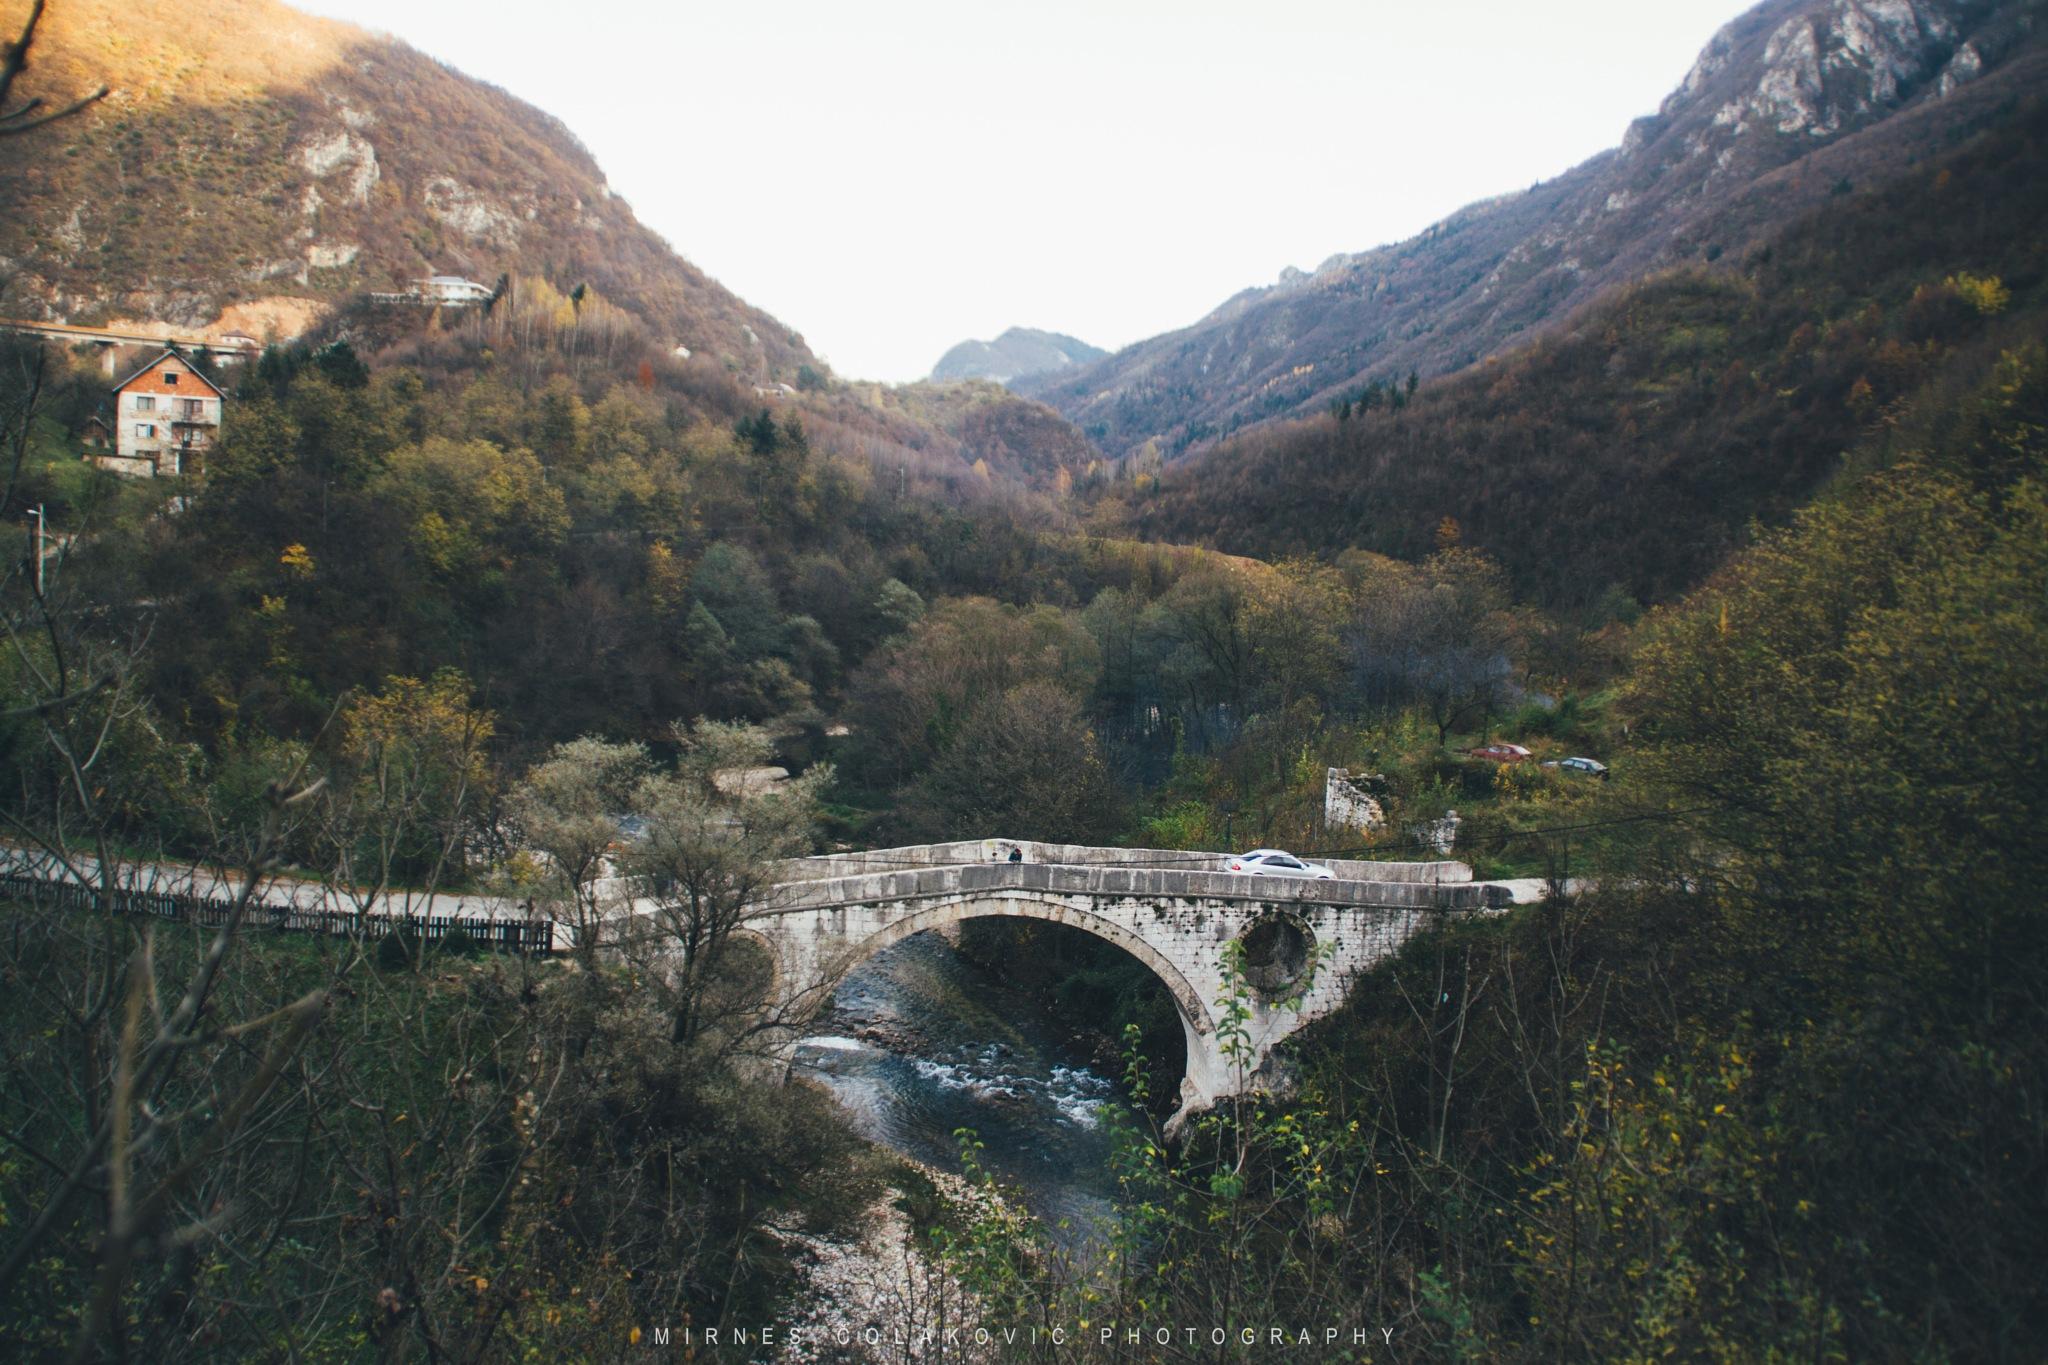 Bridge in nature by Mirnes Čolaković